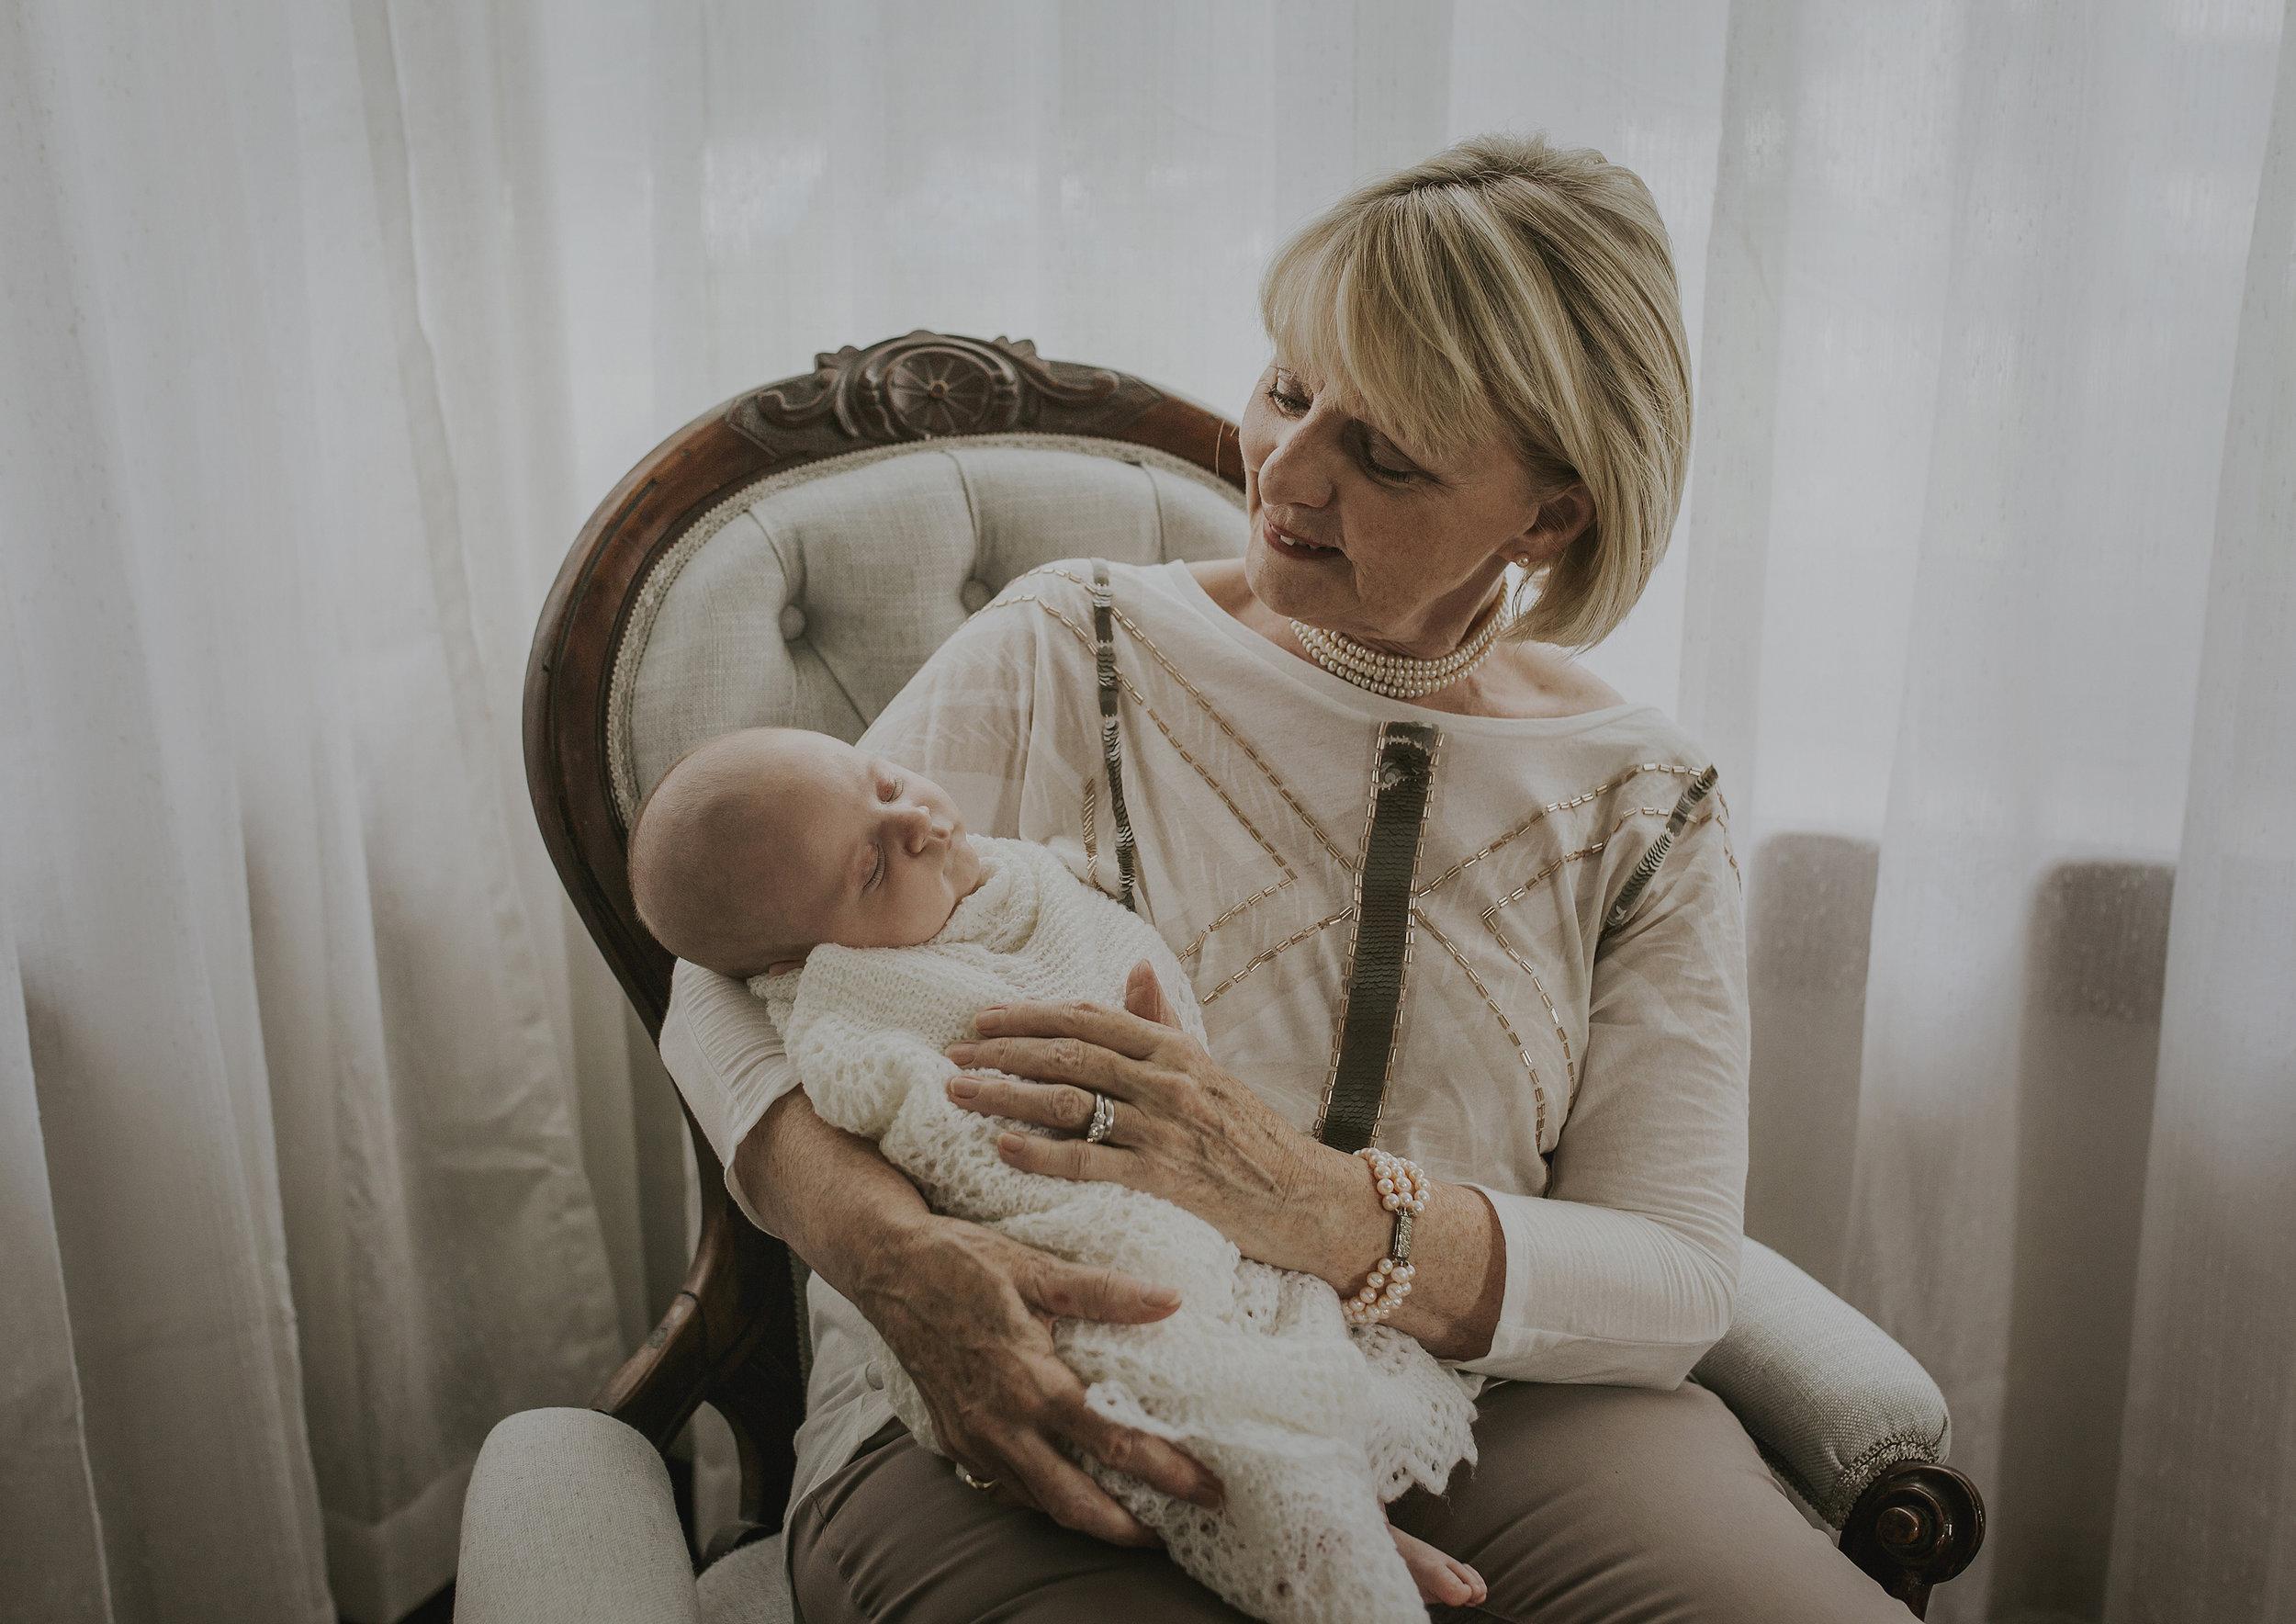 Grandmother holding her newborn baby grandson